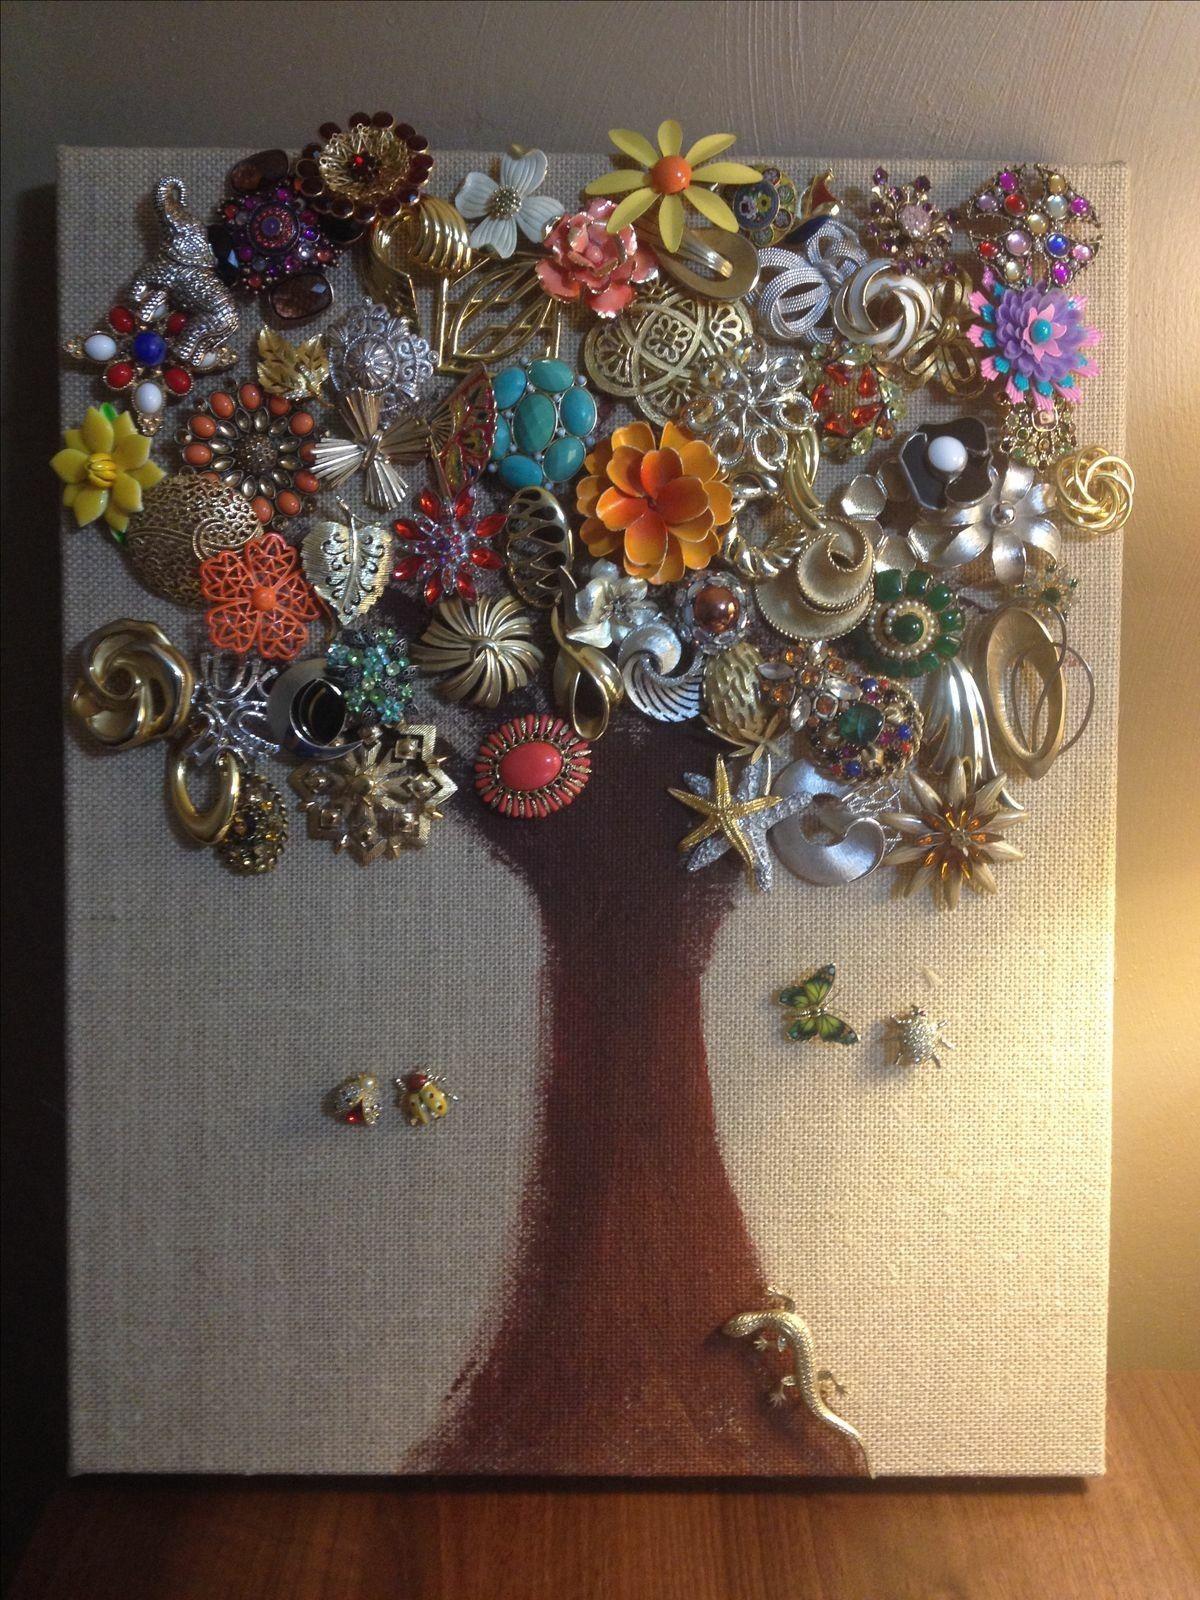 Ways To Repurpose Old Jewelry Repurpose Old Jewelry Repurposed